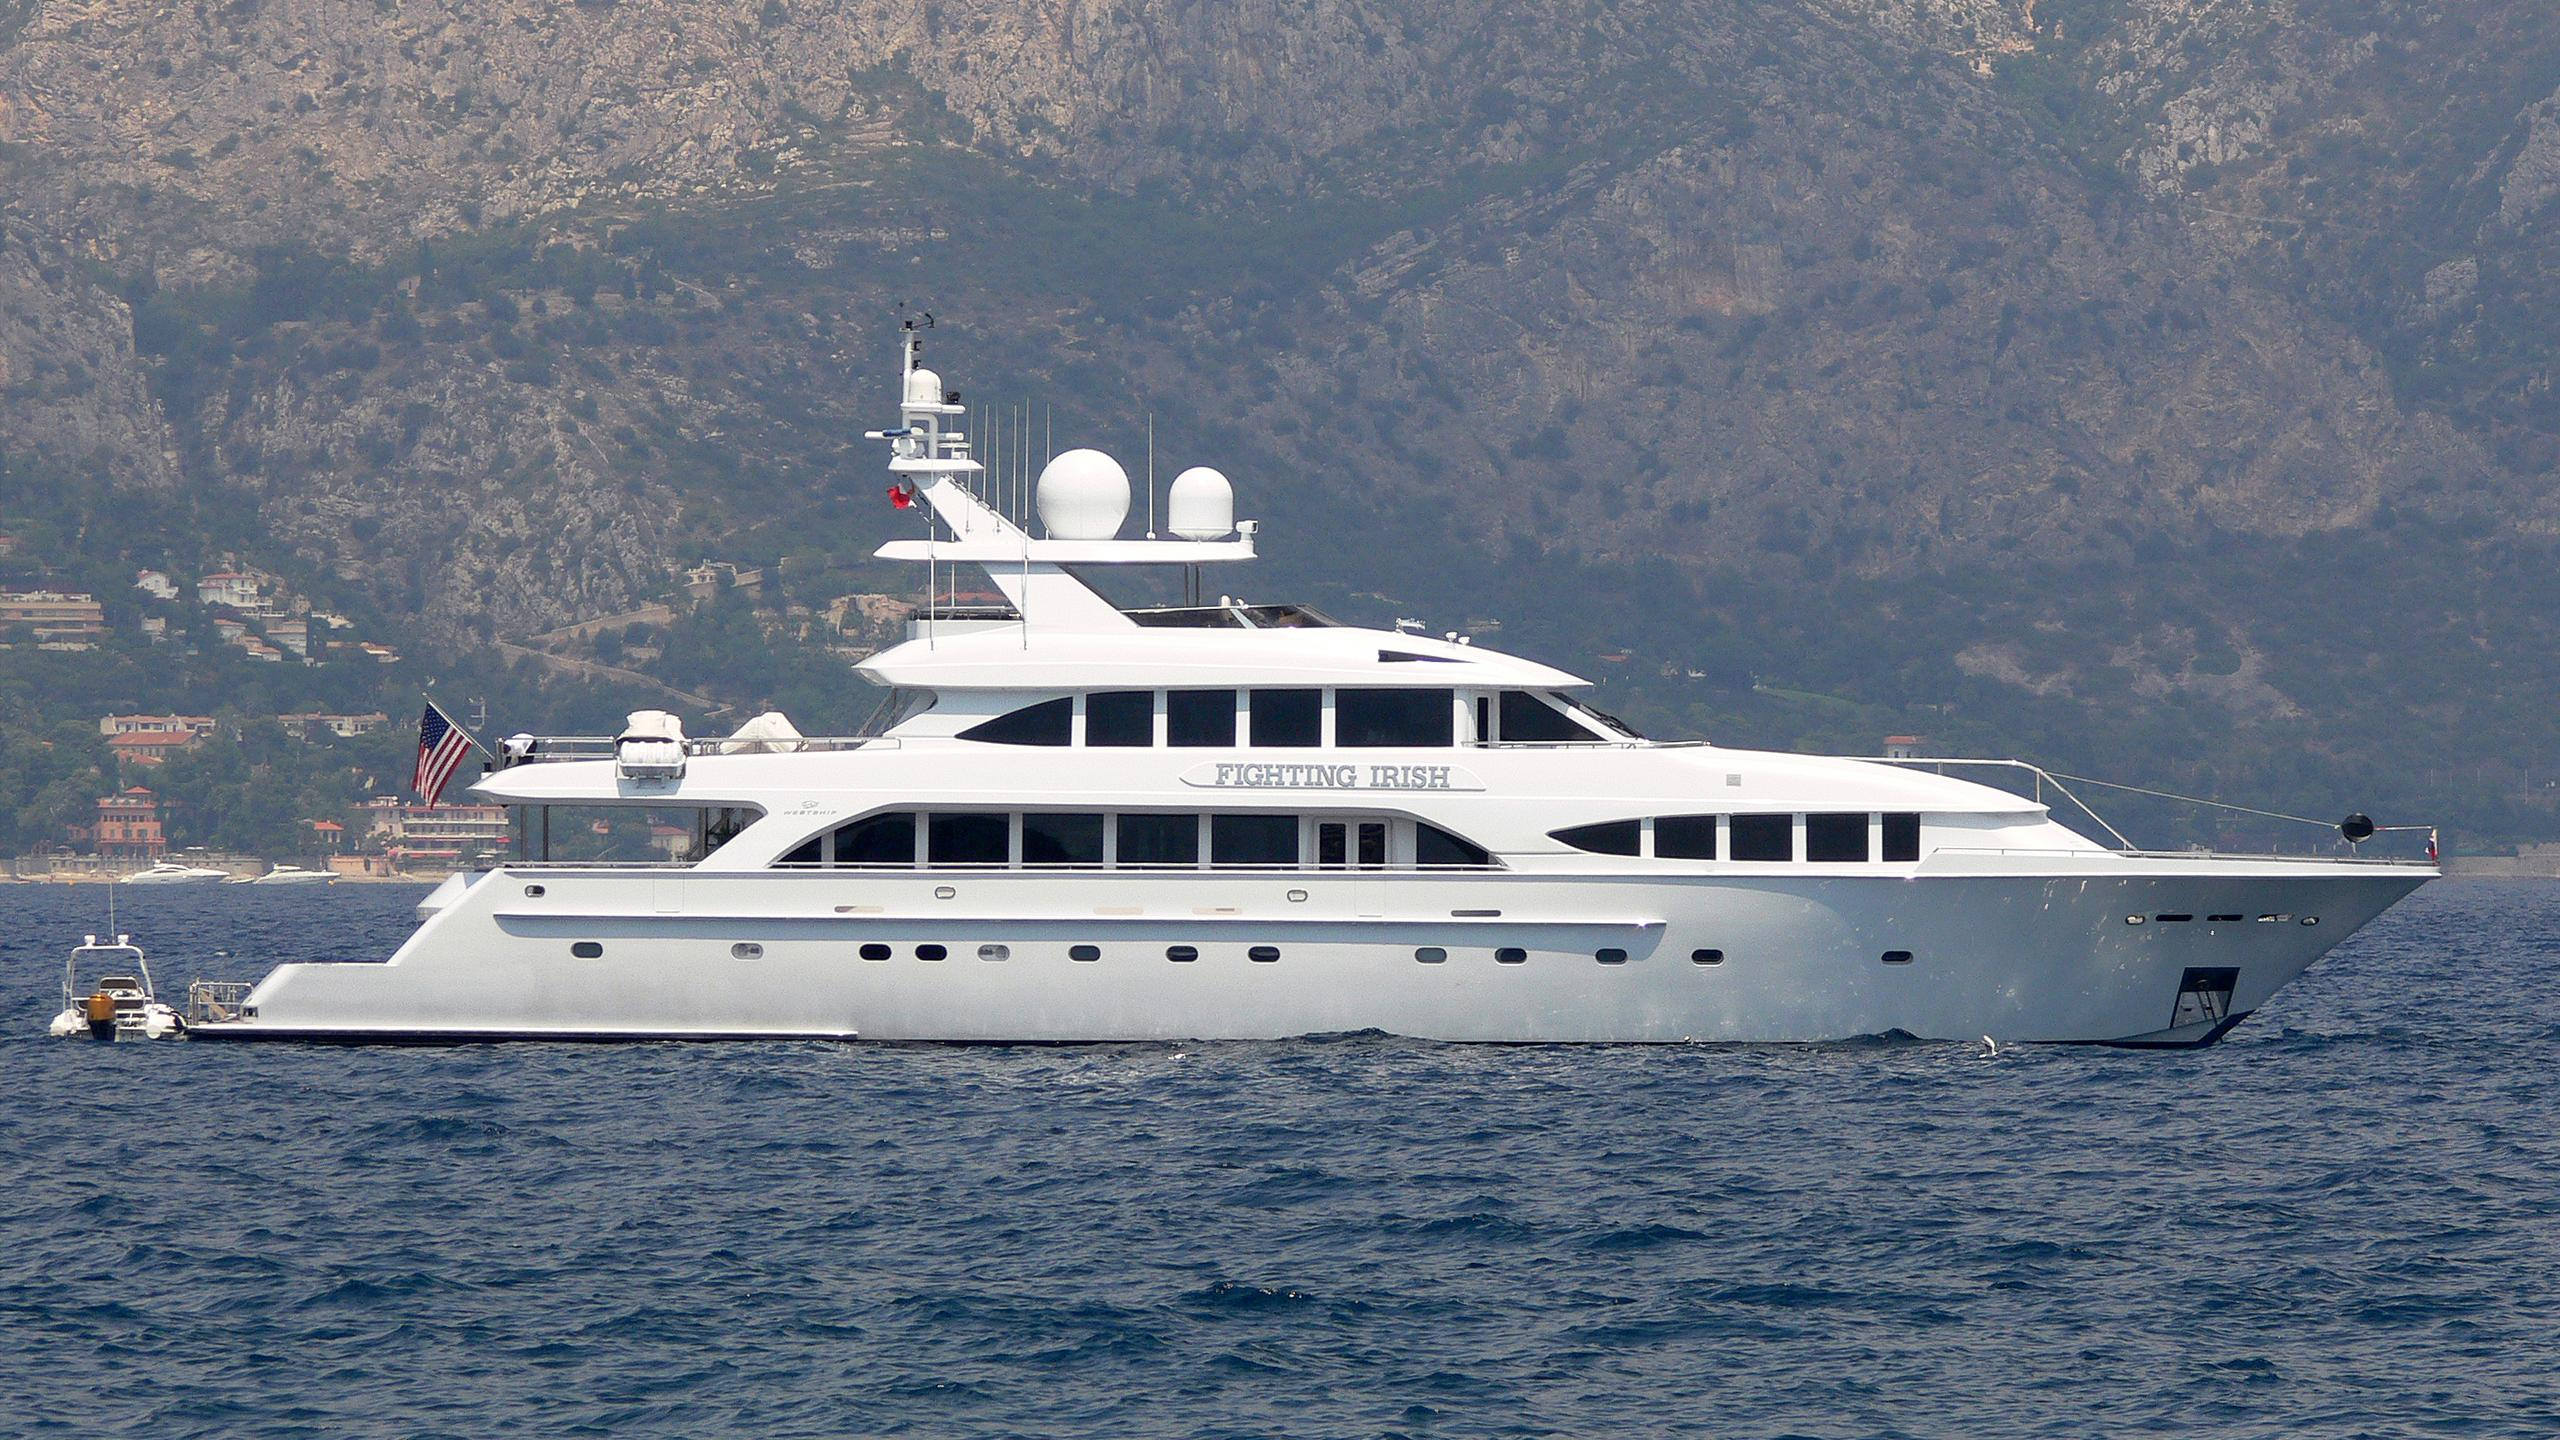 tanzanite fighting irish motoryacht westship 44m 2004 profile before refit